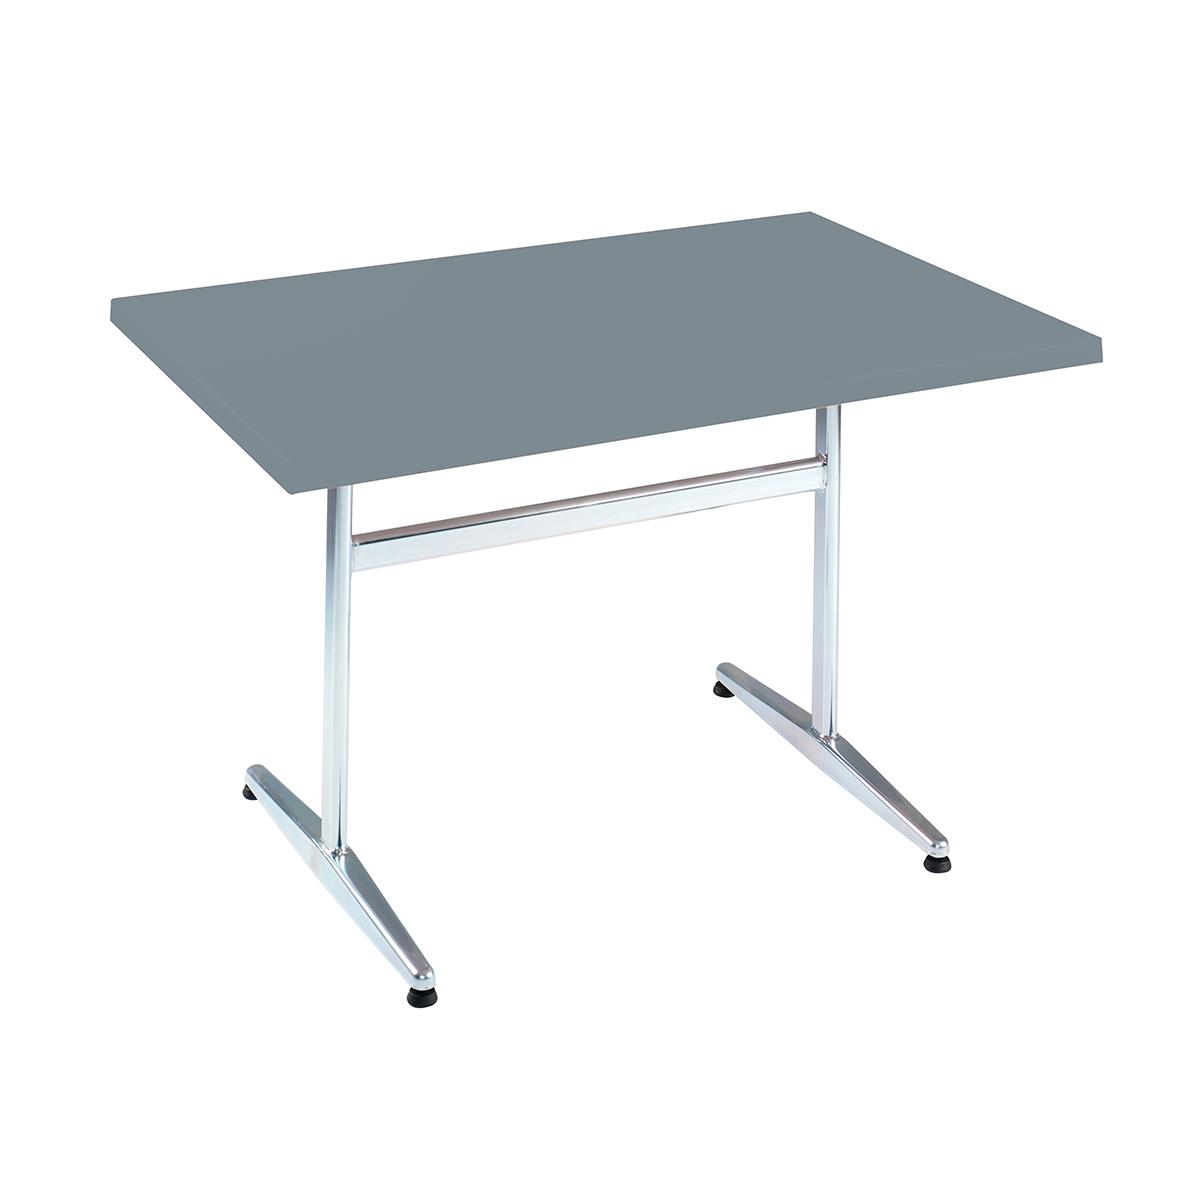 GFK Tisch fehgrau 120x70